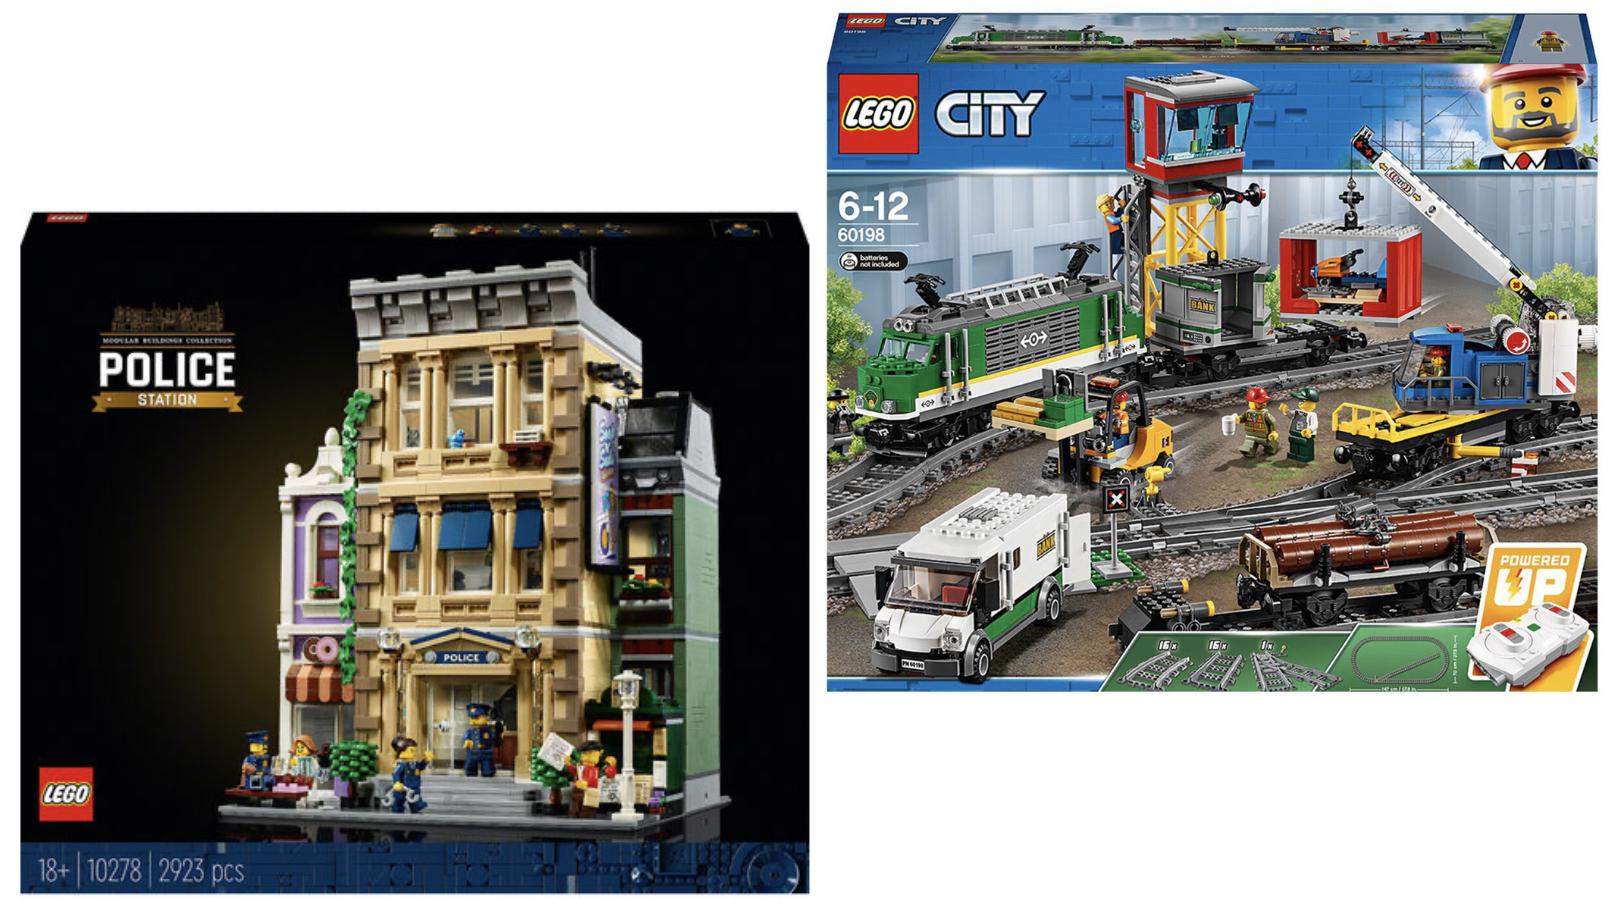 LEGO City 60198 Güterzug inkl. motorisierter Lok für 117,99€ / LEGO Creator 10278 Polizeistation für 159,99€ + 10% Shoop!